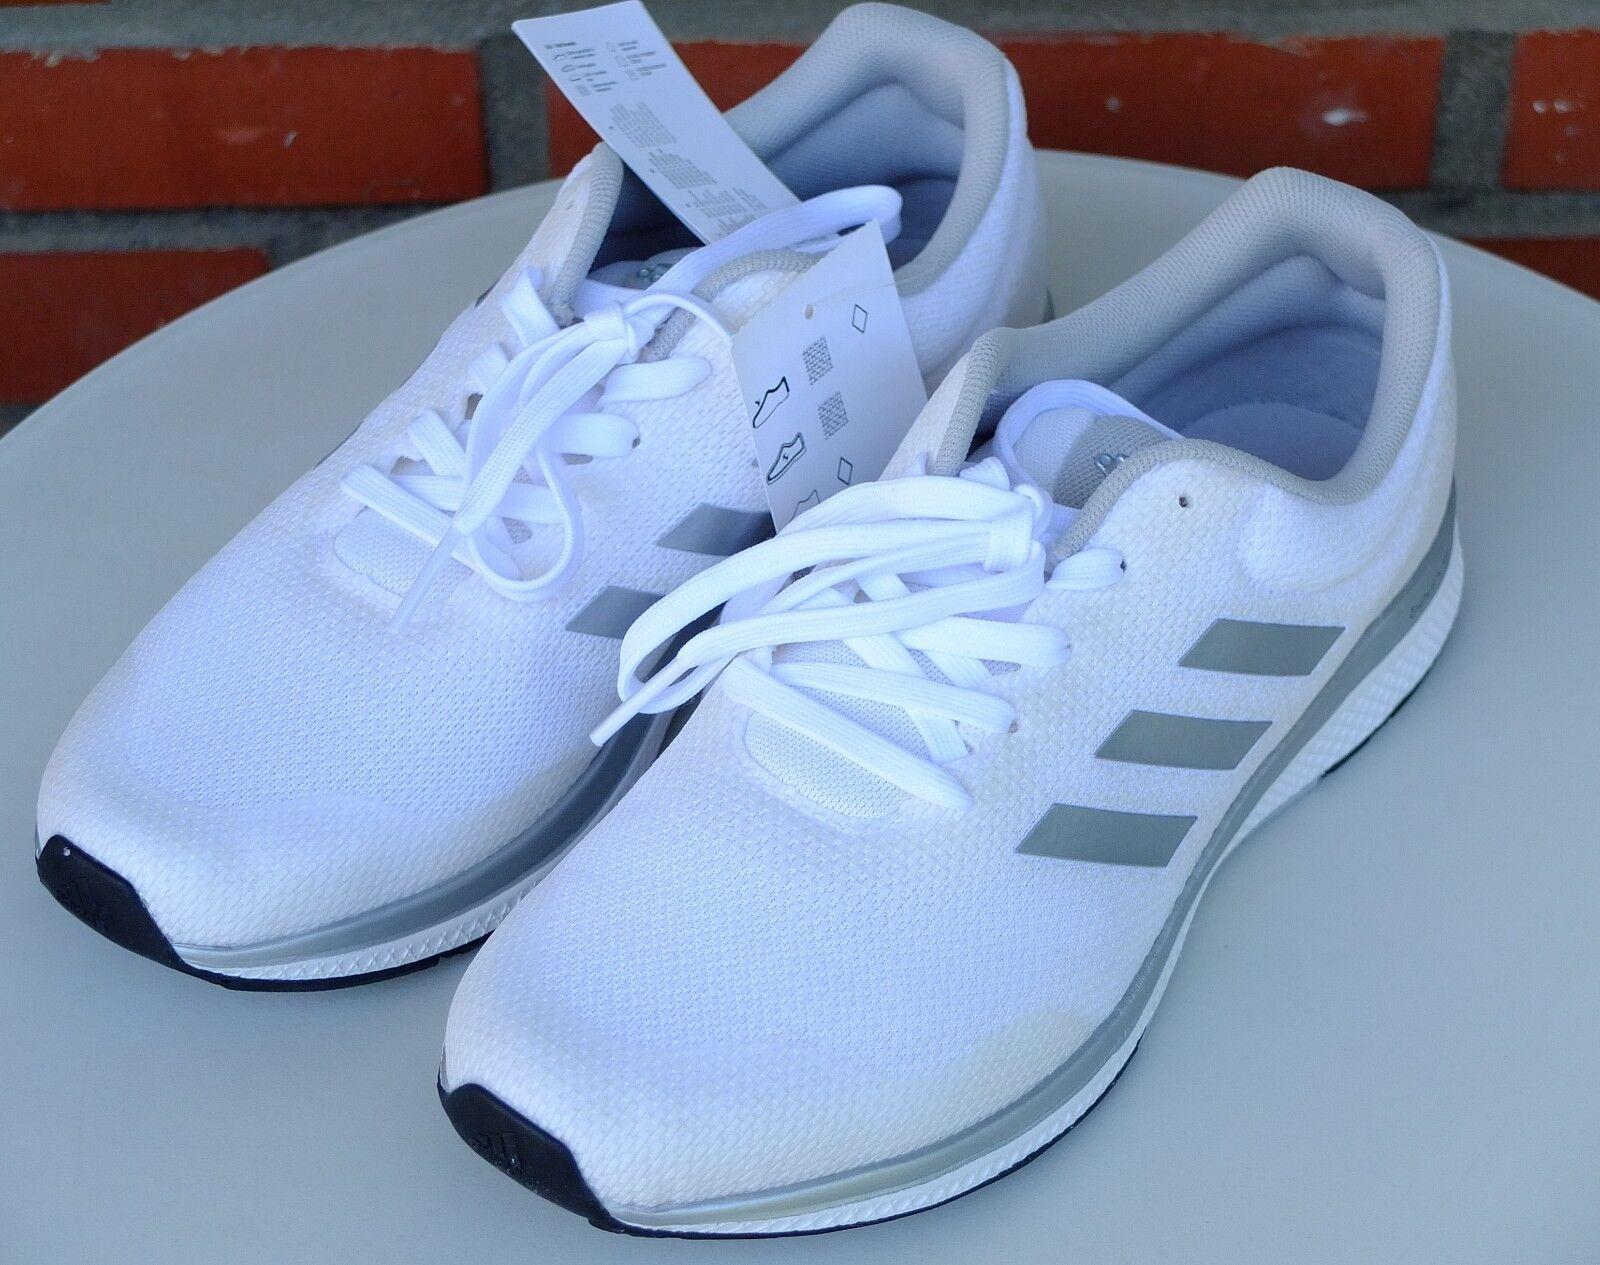 Adidas mana bounce 2 aramis  Sportschuhe Turnschuhe Sneaker Gr.  aramis 43 ed309b